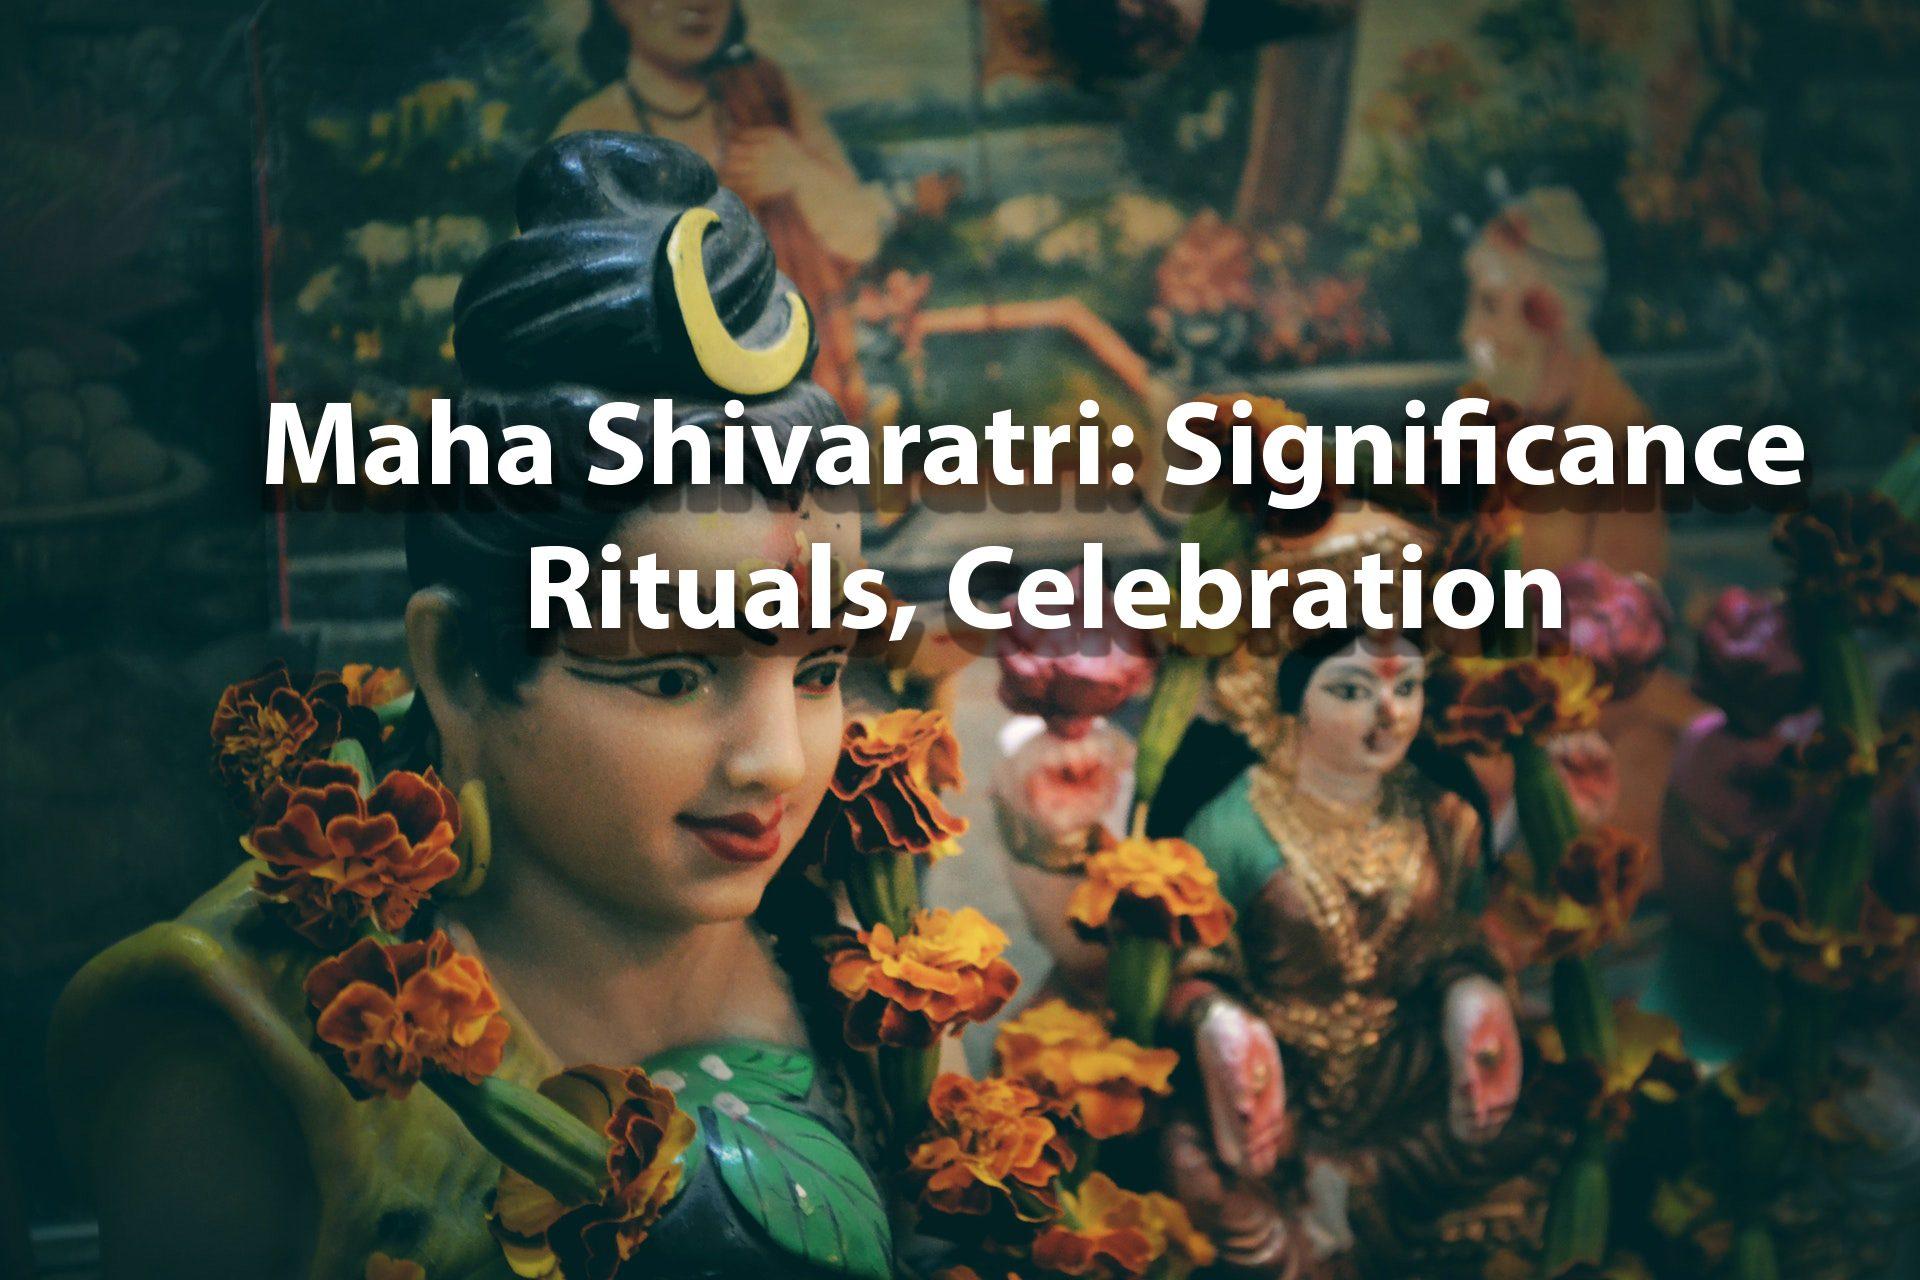 Maha Shivaratri significance rituals celebration